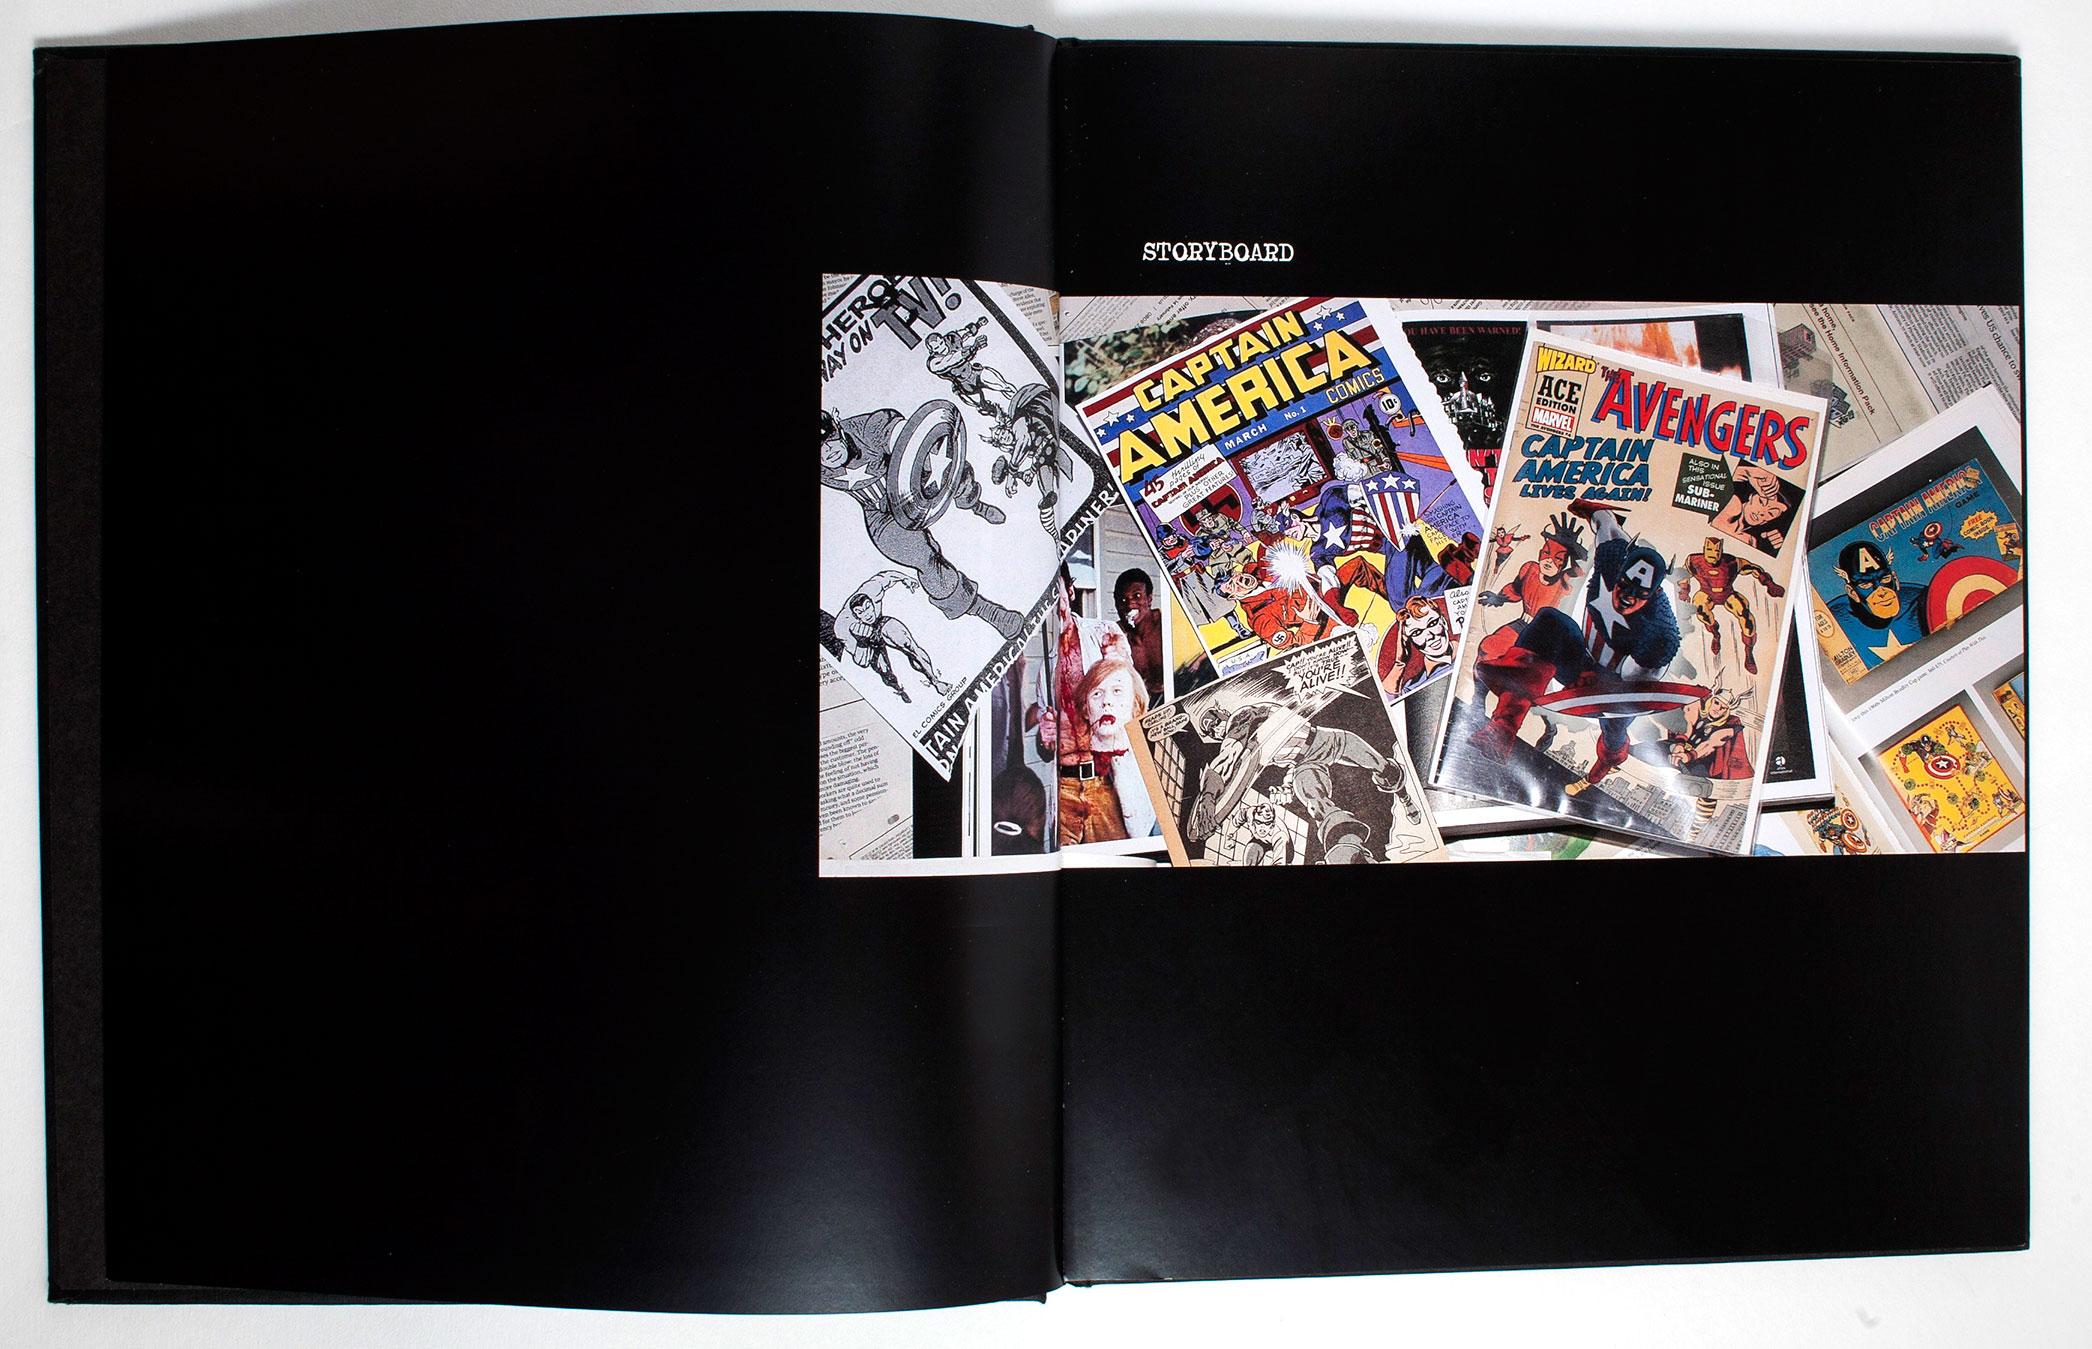 epm-print-management-bristol-art-books-ben-turnbull-5.jpg